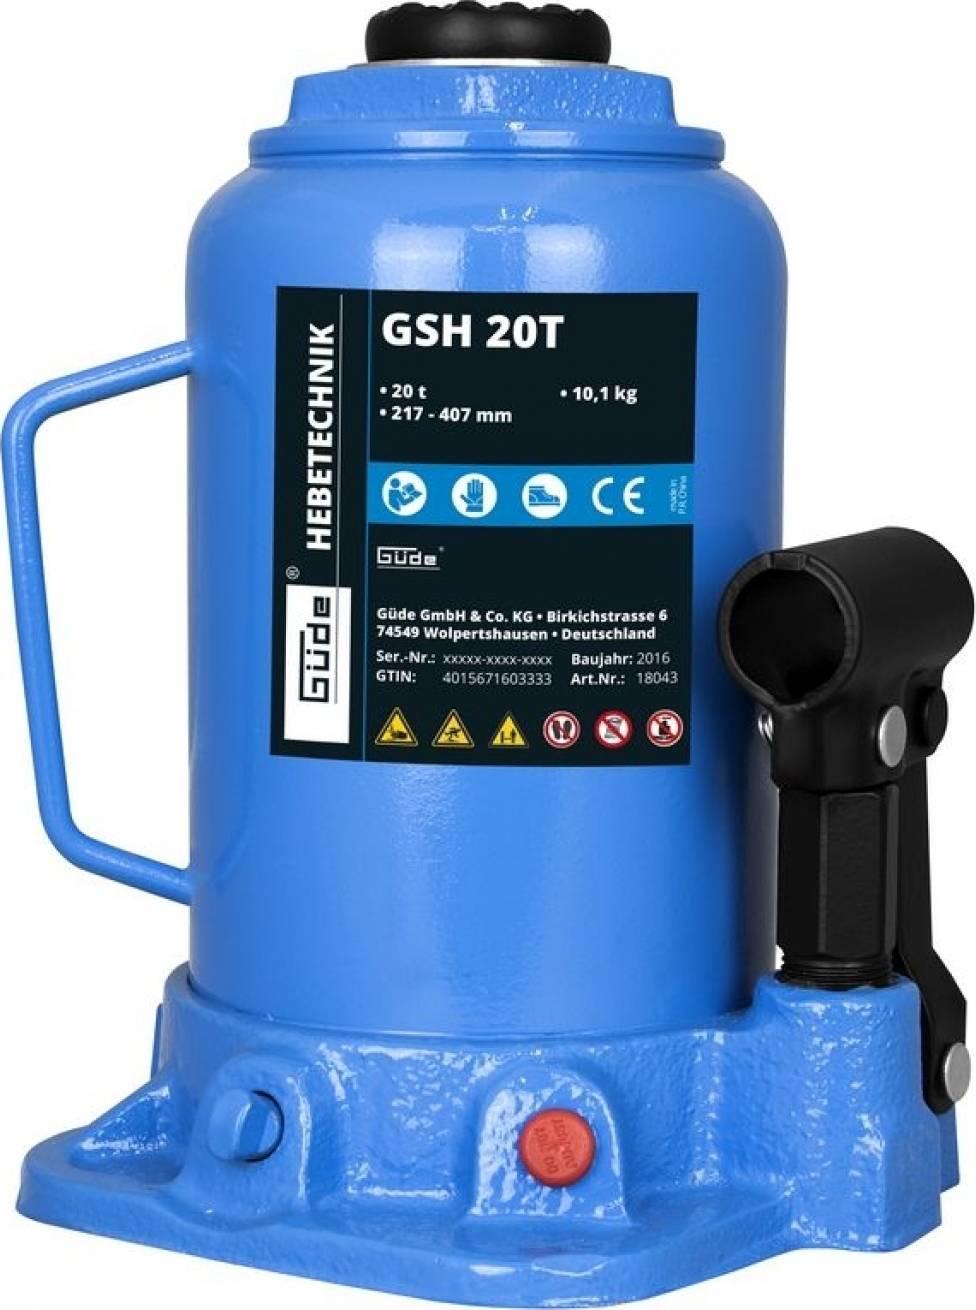 Hydraulický zvedák GSH 20T 18043 GÜDE